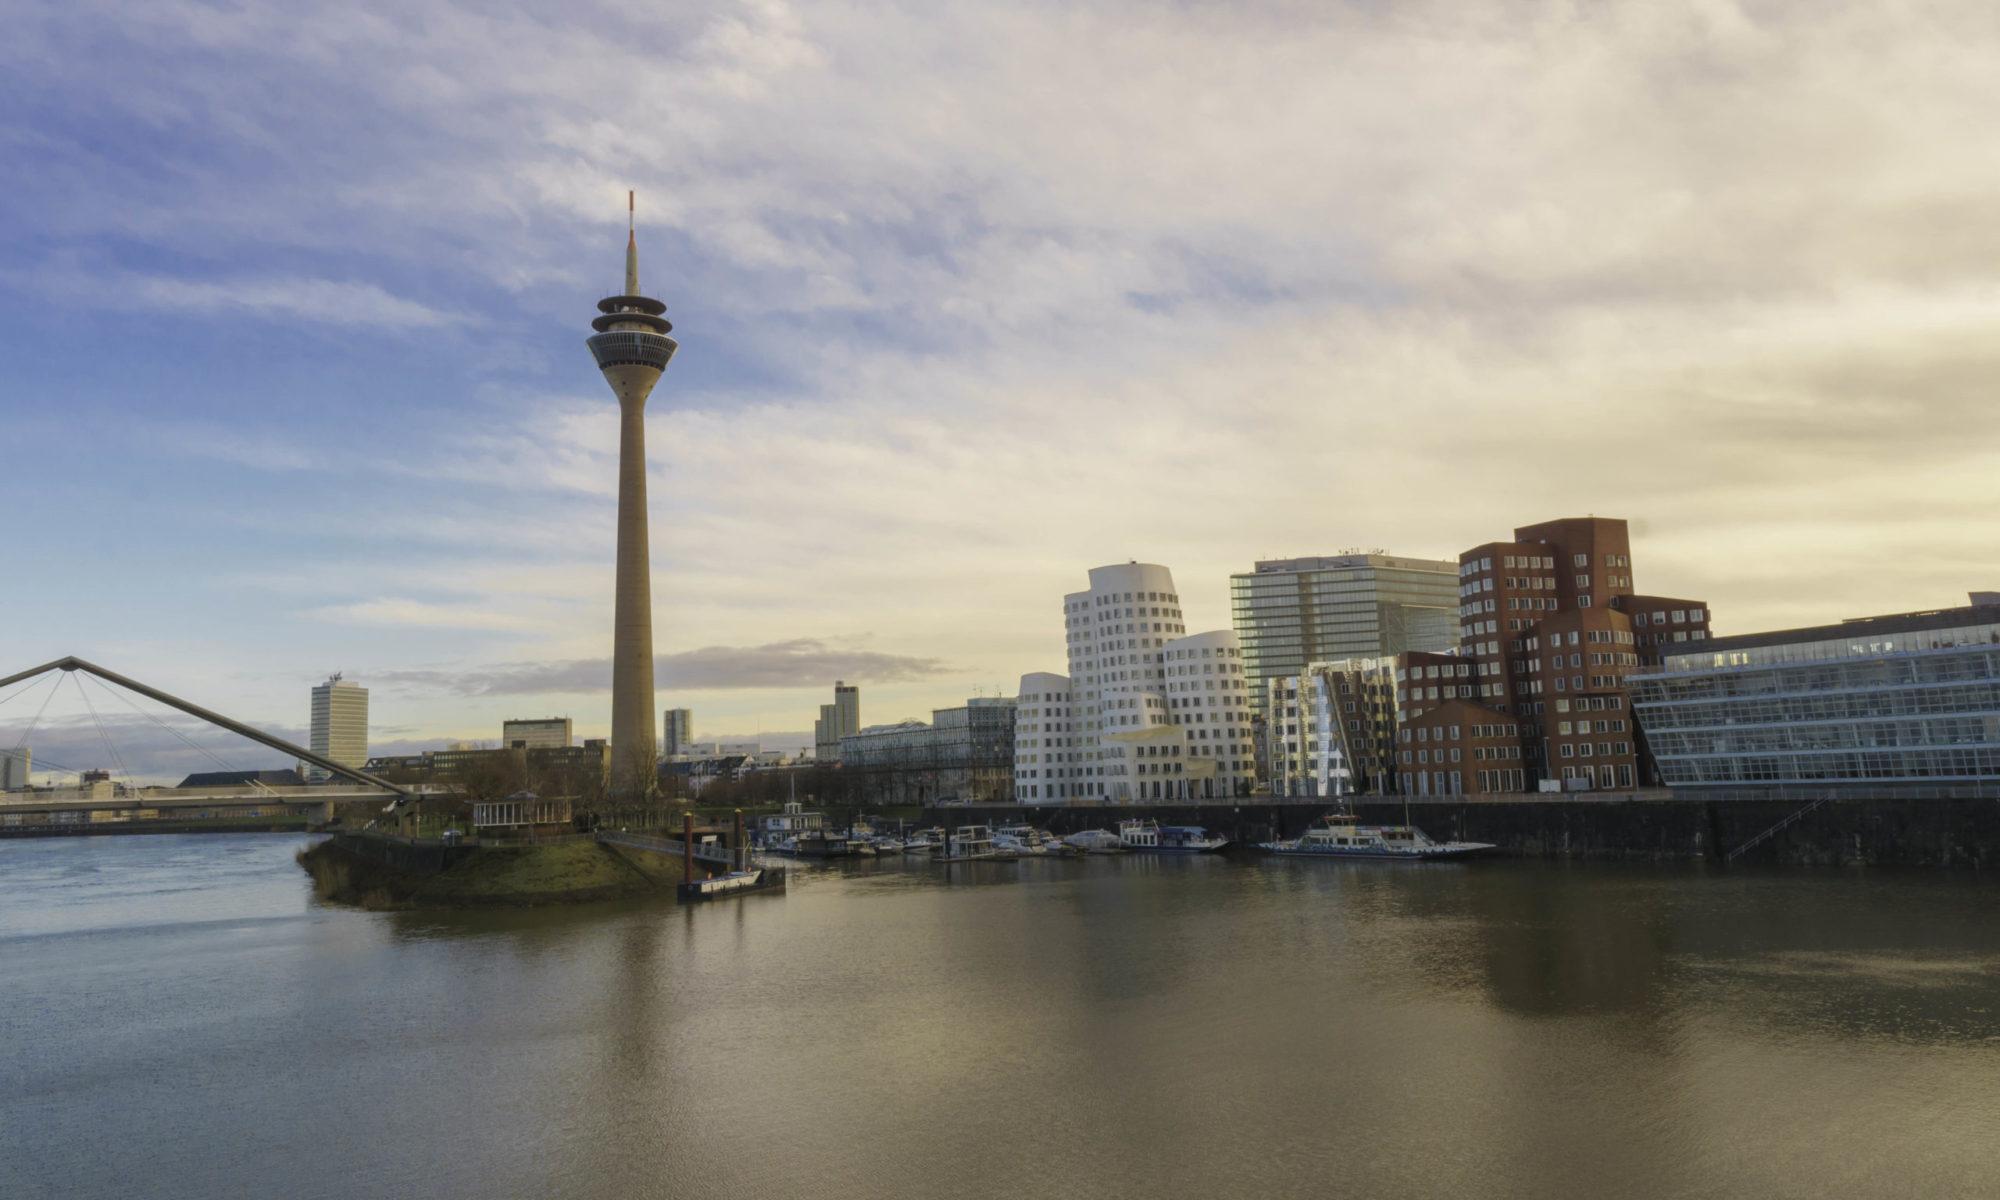 cropped-Immobilienmakler-Mettmann_Duesseldorf-scaled-1.jpg